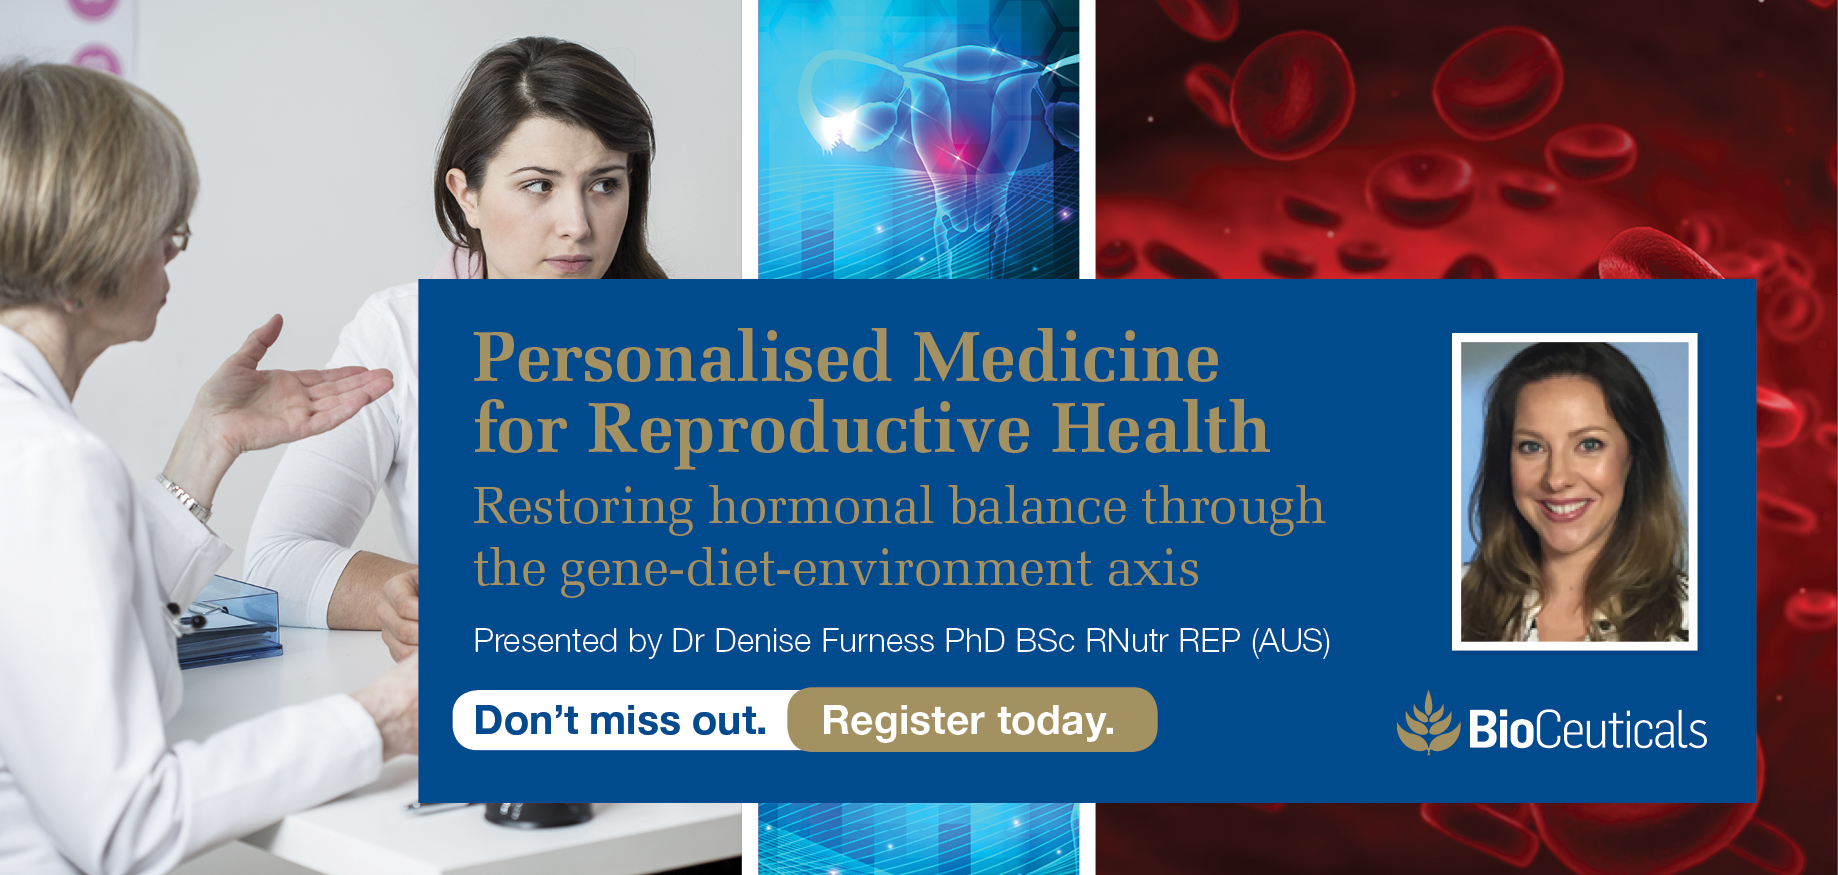 PersonalisedMedicineforReproductiveHealth-Sydney.jpg